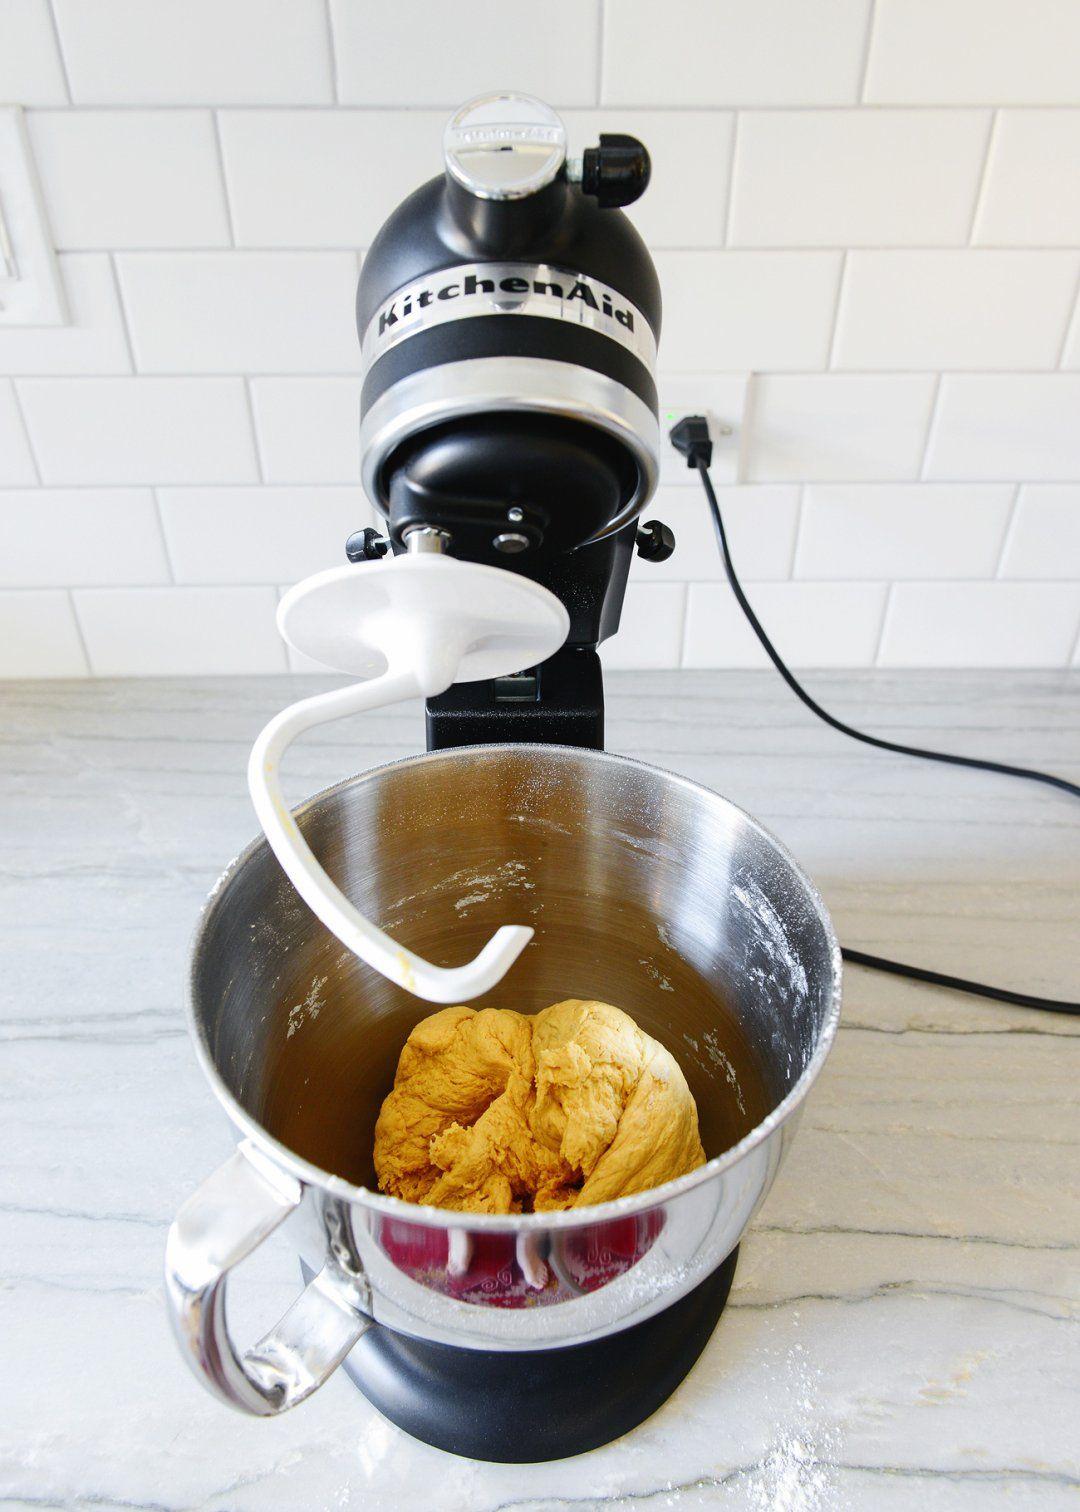 How To Make Pasta With A Kitchenaid Mixer Kitchen Aid